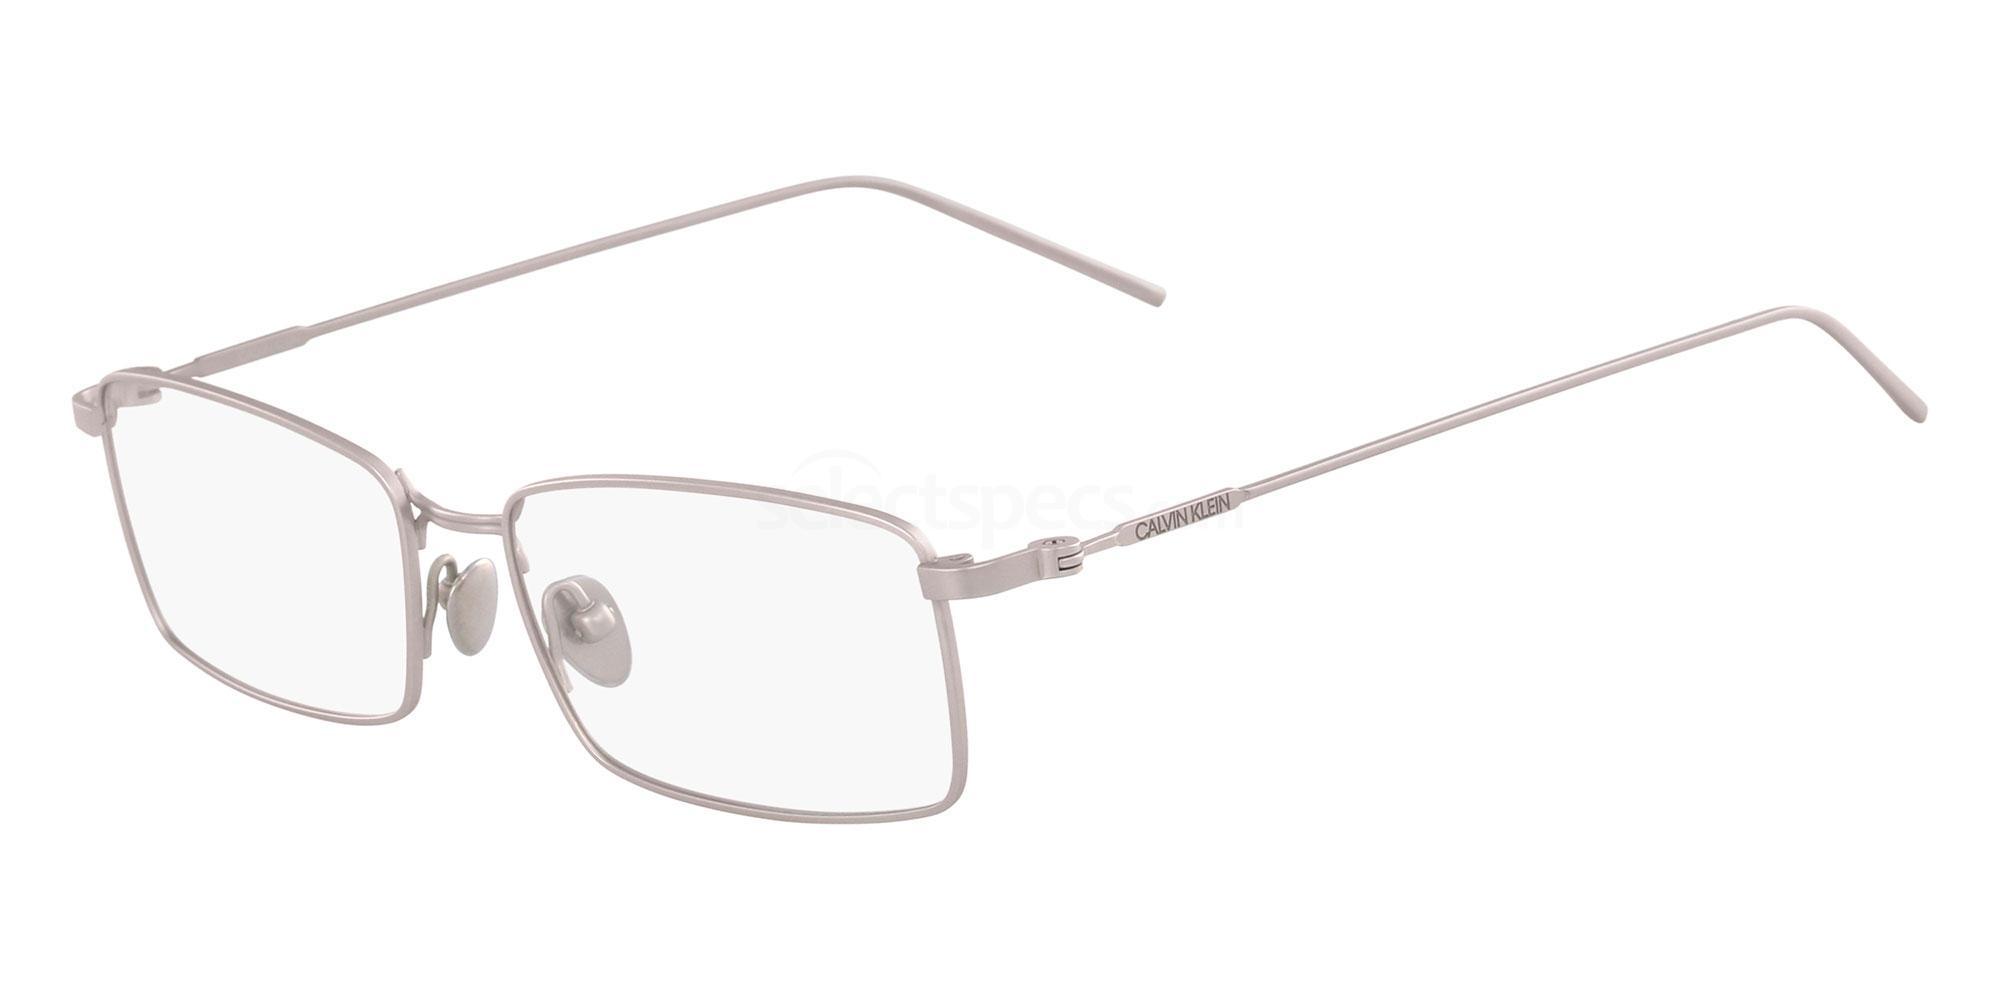 045 CK18119 Glasses, Calvin Klein